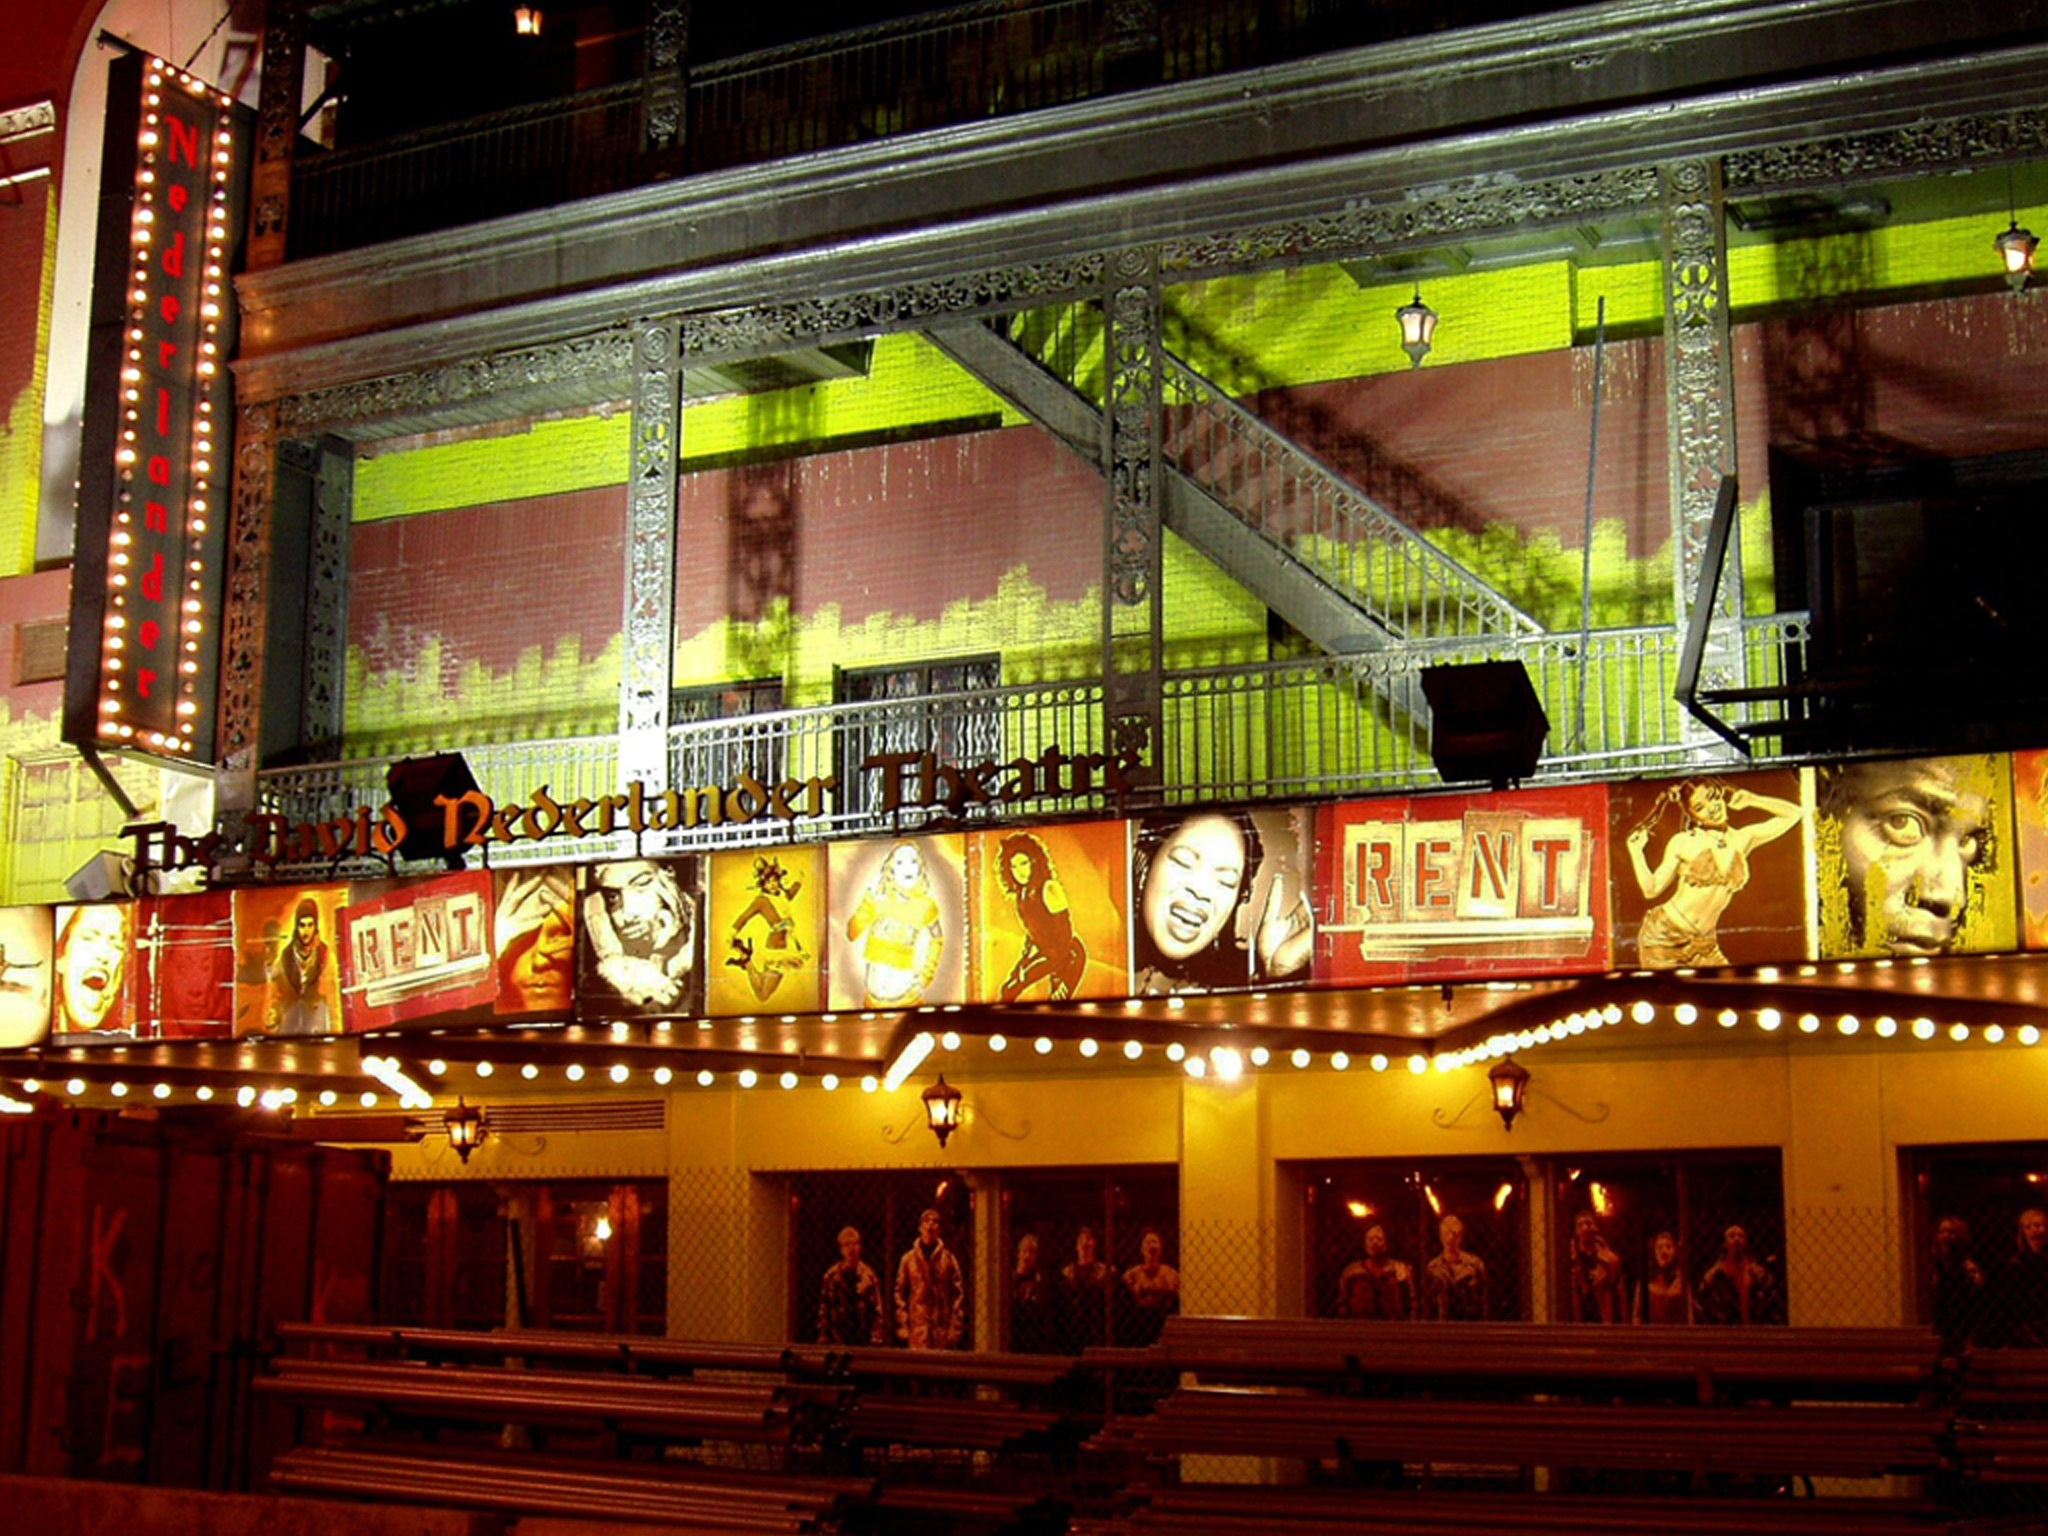 Rent on Broadway Marquee at the Nederlander Theatre